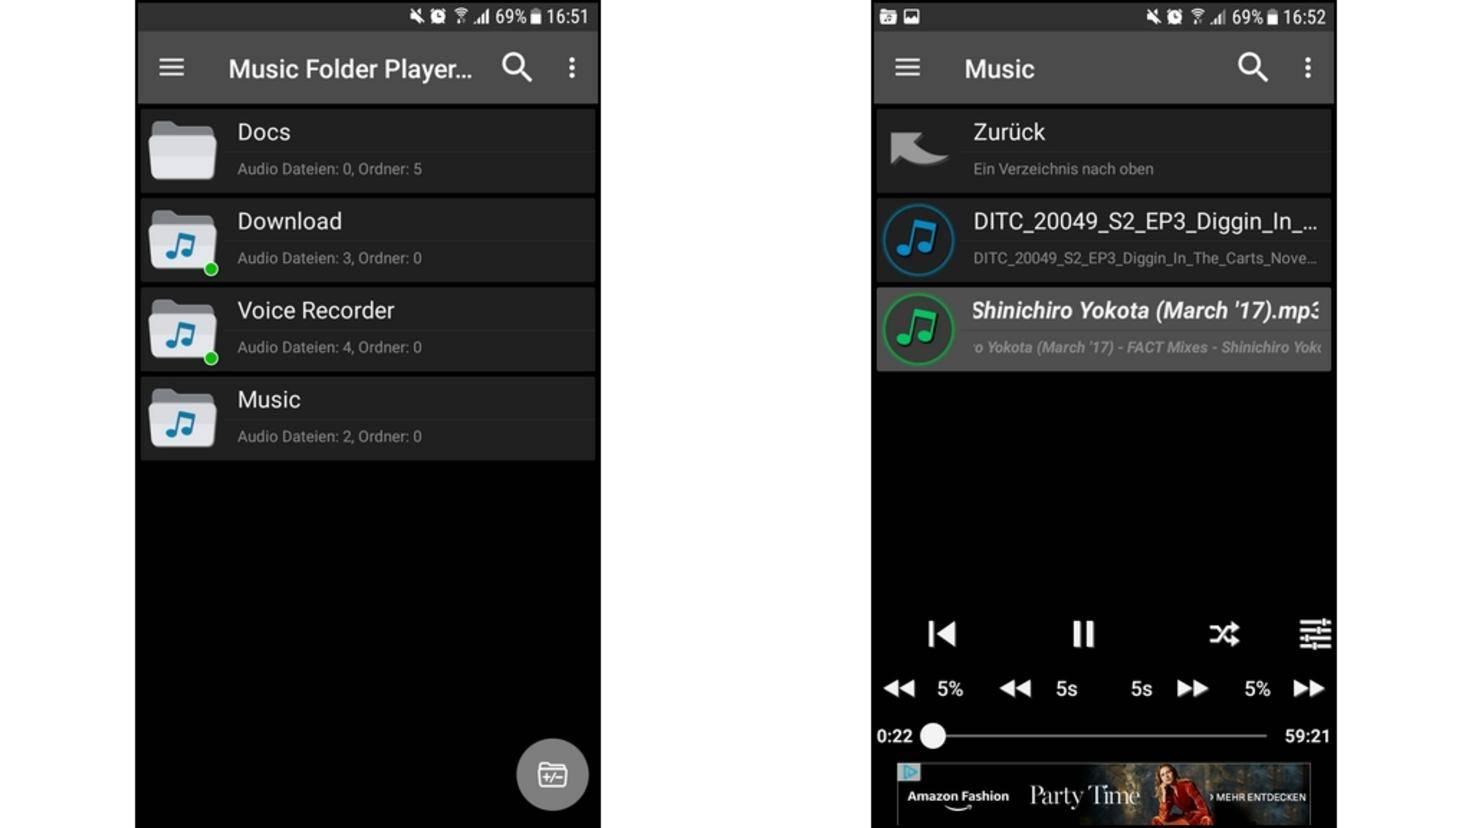 Music-Folder-Player